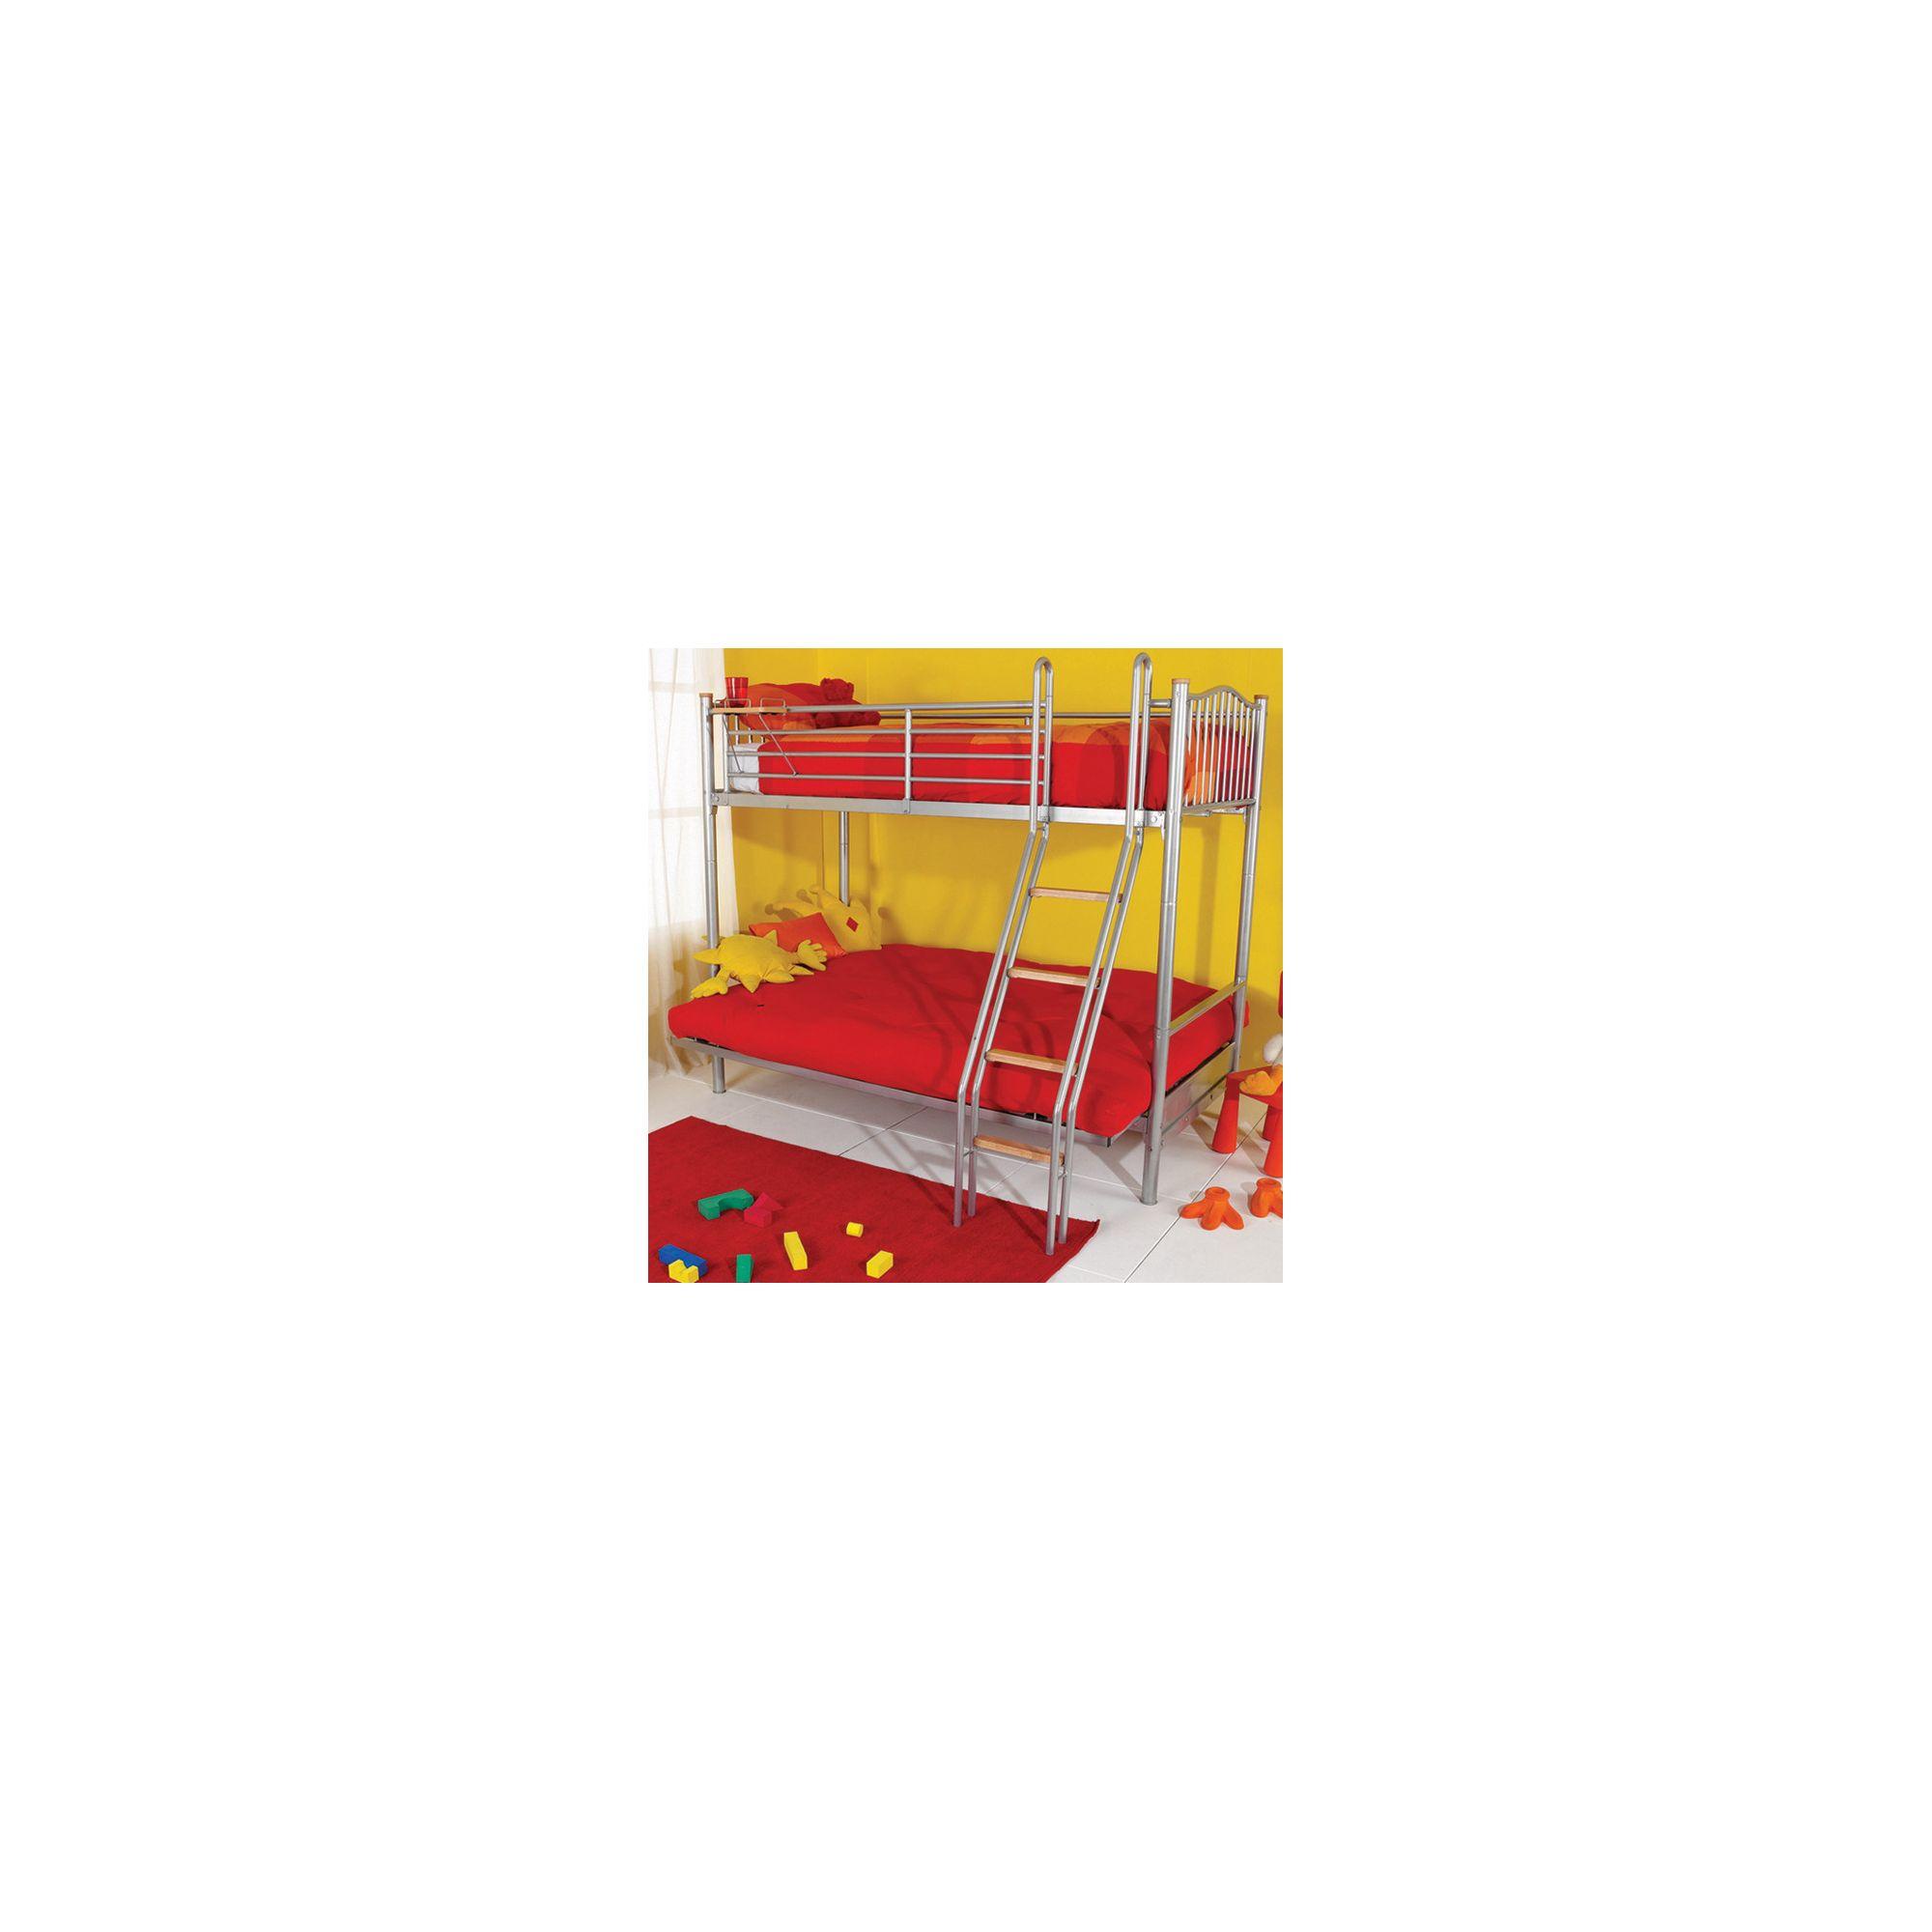 Hyder Alaska Futon Bunk Bed Frame at Tesco Direct